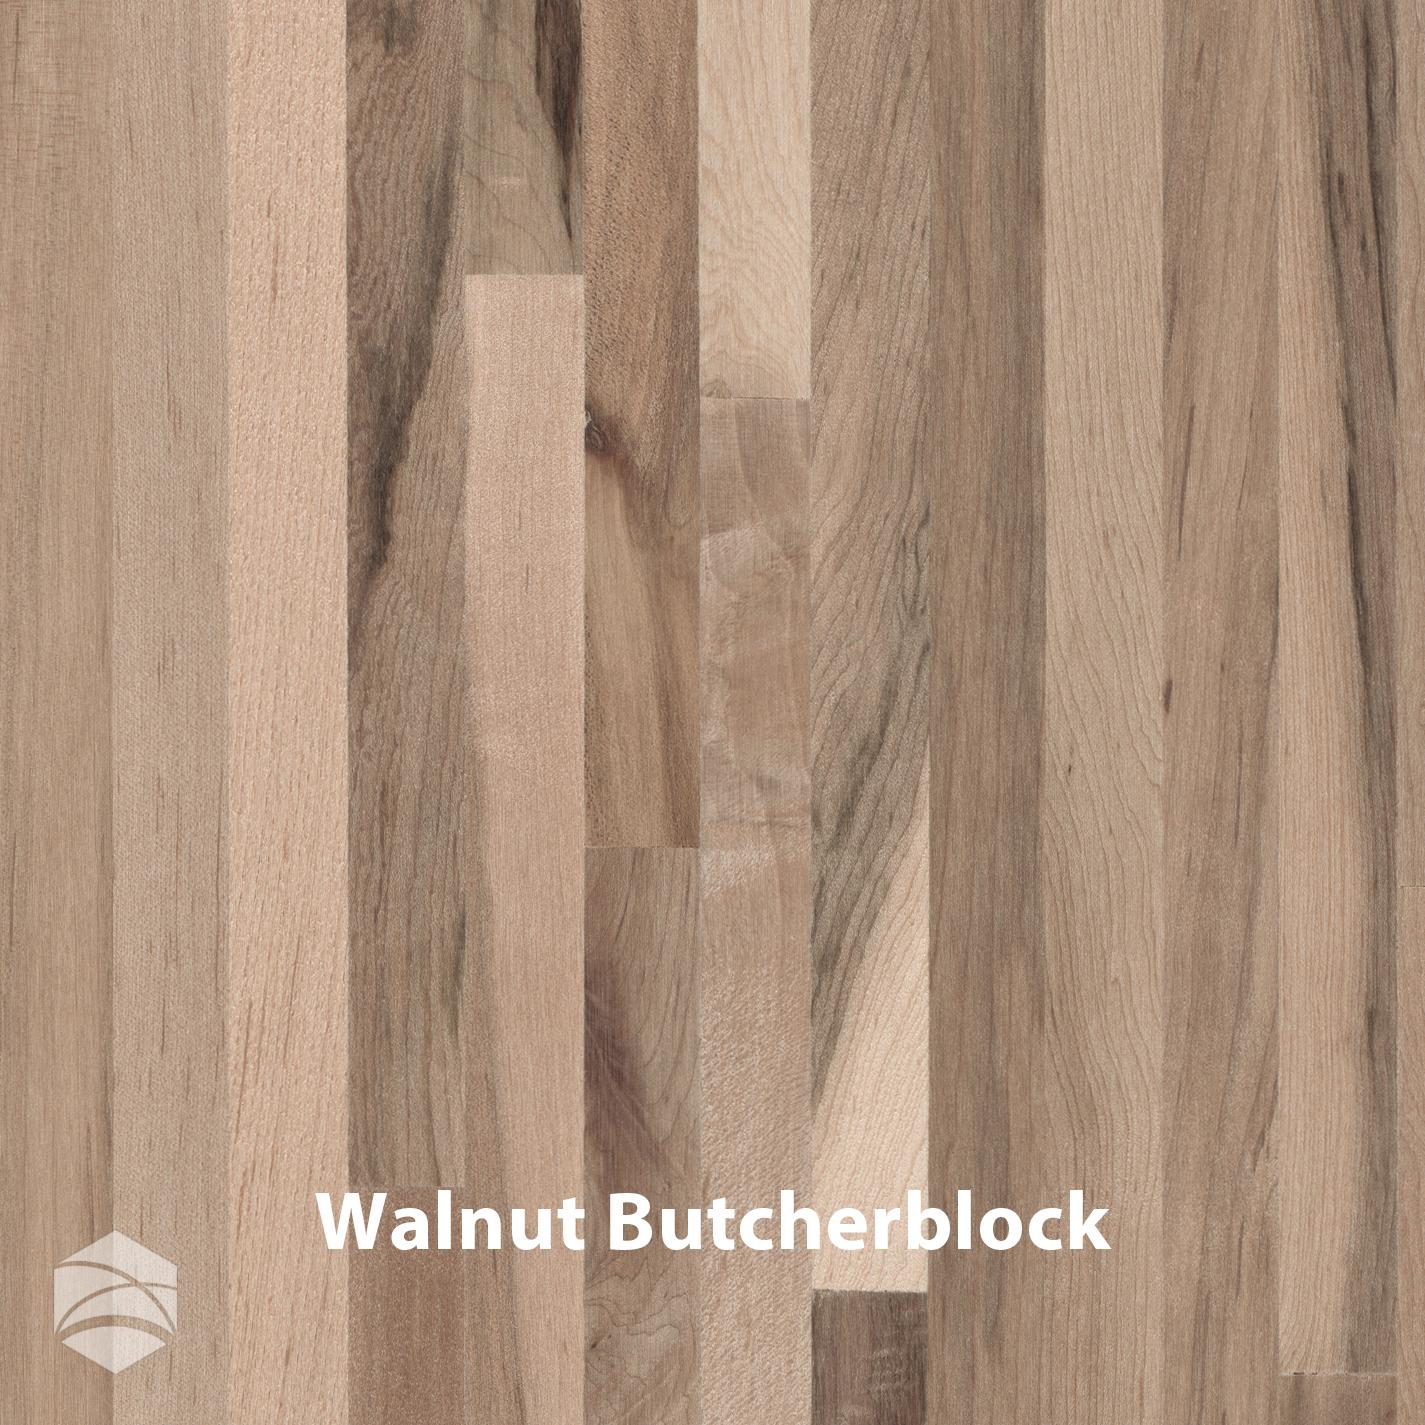 Walnut Butcherblock_V2_14x14.jpg